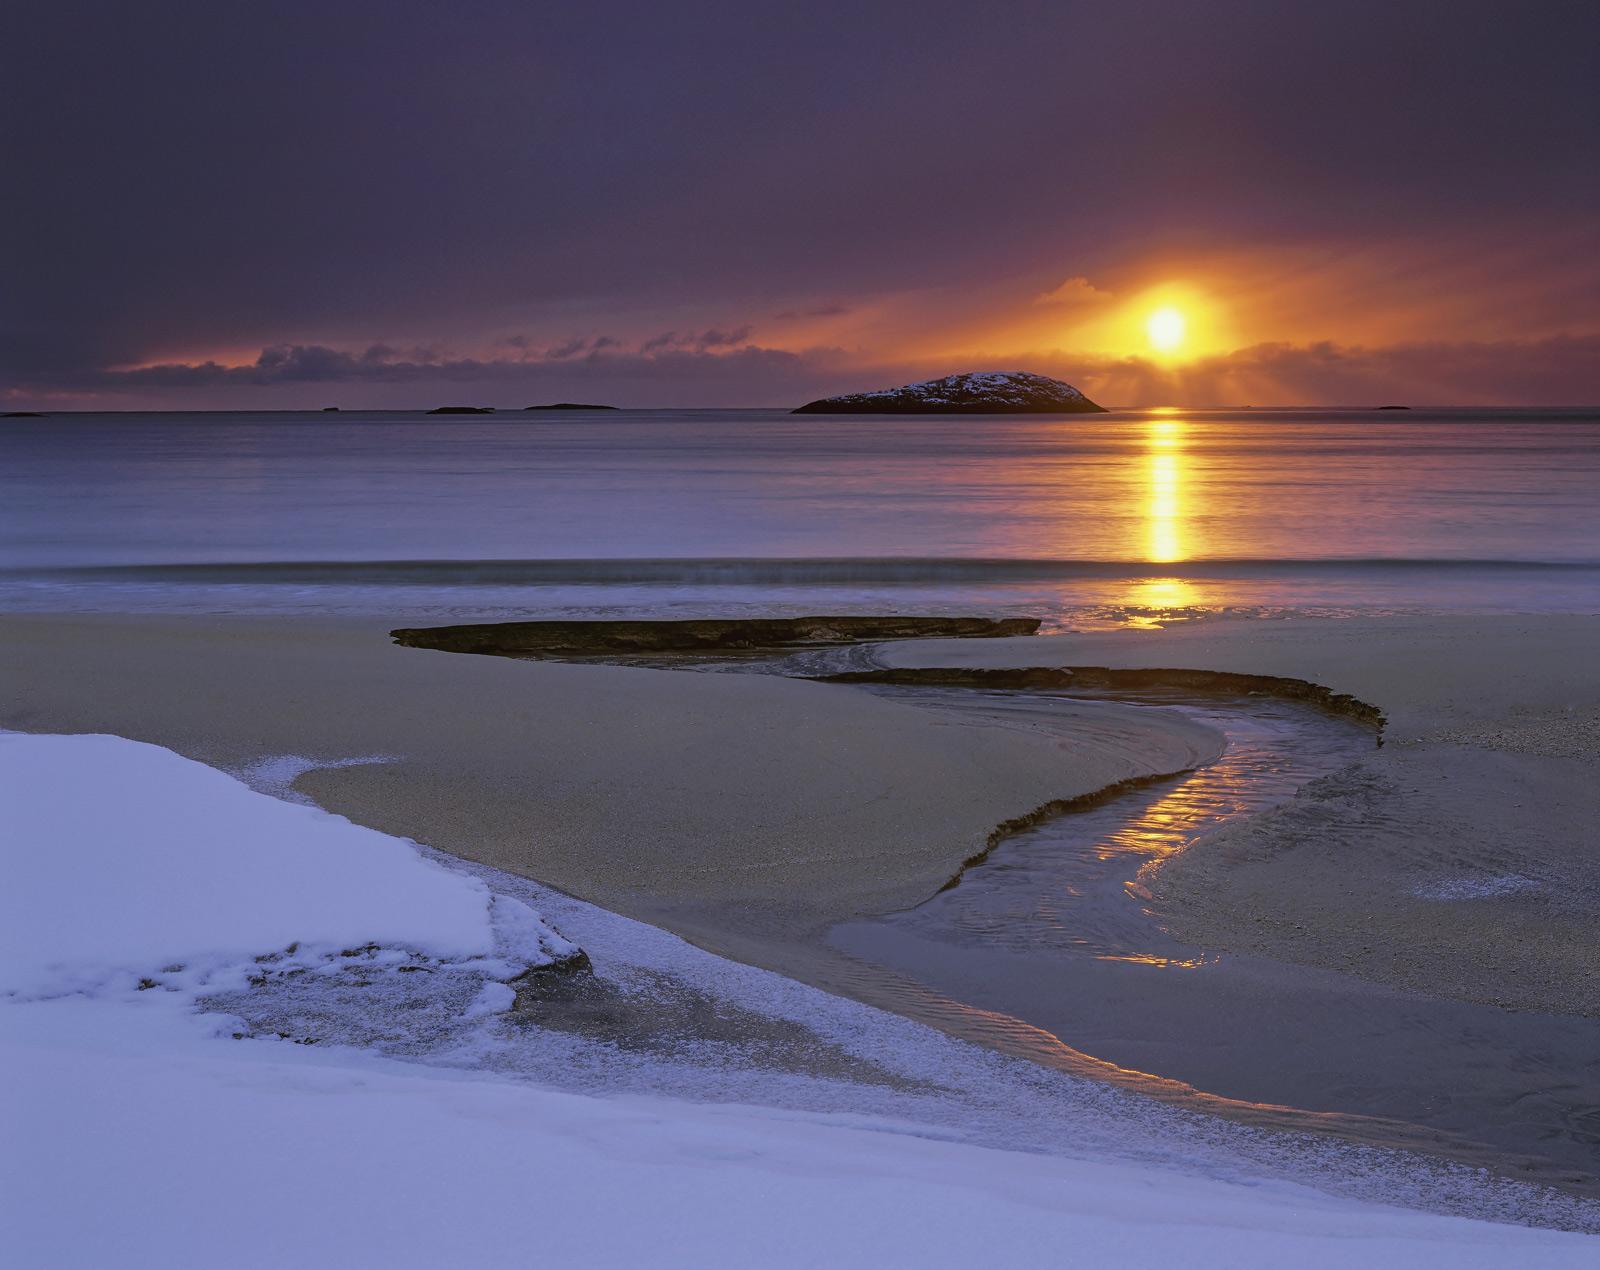 Senja Sublime, Bovaer, Senja, Norway, beach, sun, snow, black, rocks, sandy, sunset, apricot, clouds, crespecular, rays,, photo